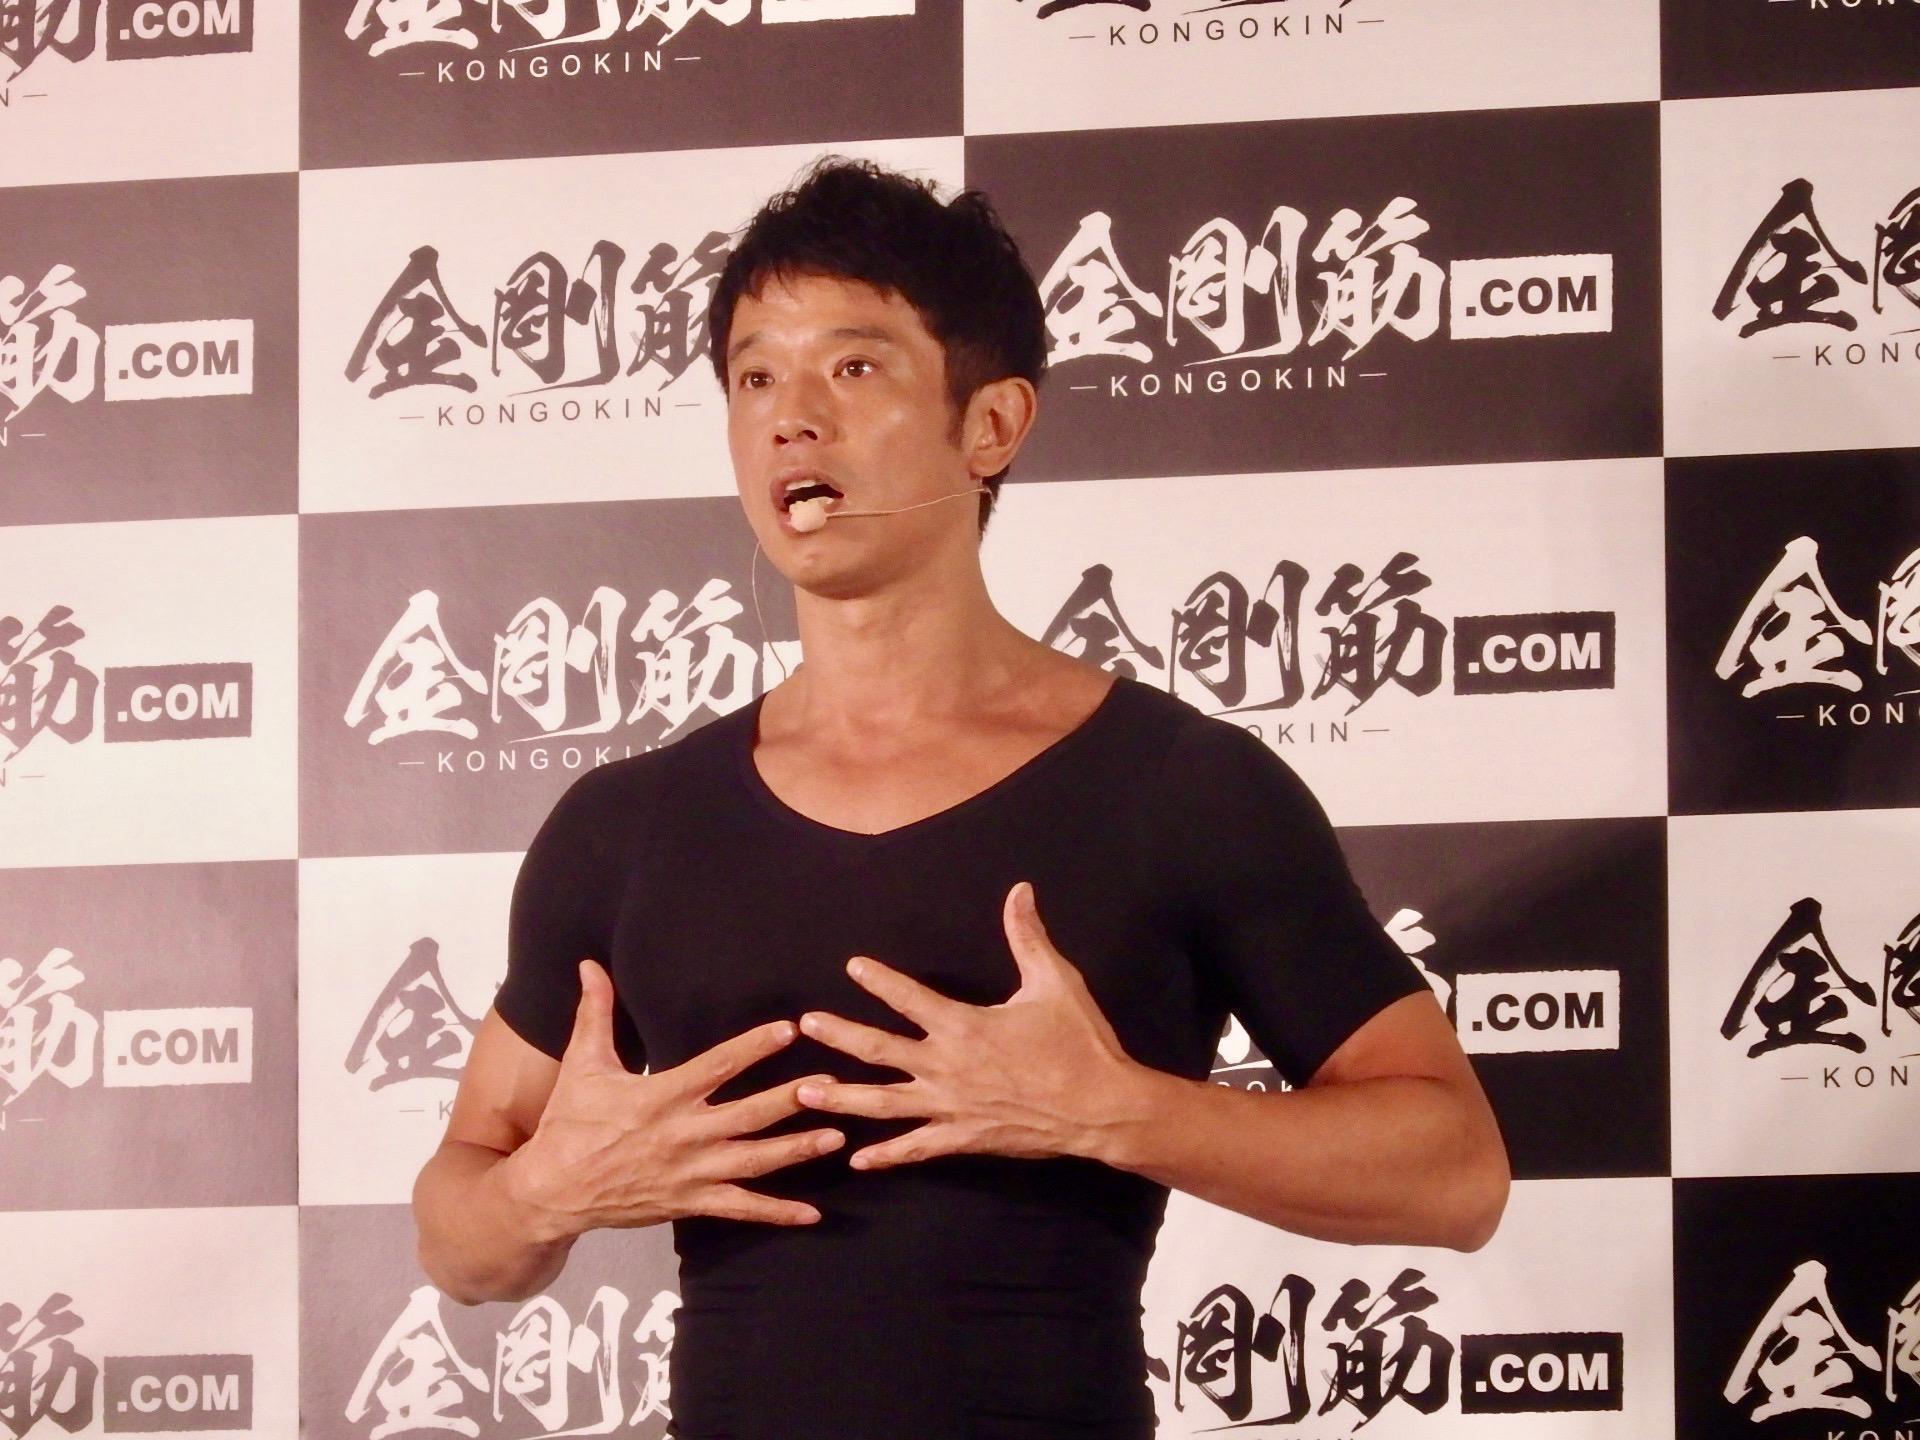 http://news.yoshimoto.co.jp/20170913205505-0c6a6bf9acfa7abe7560e0125f9edeba305b6ec3.jpg